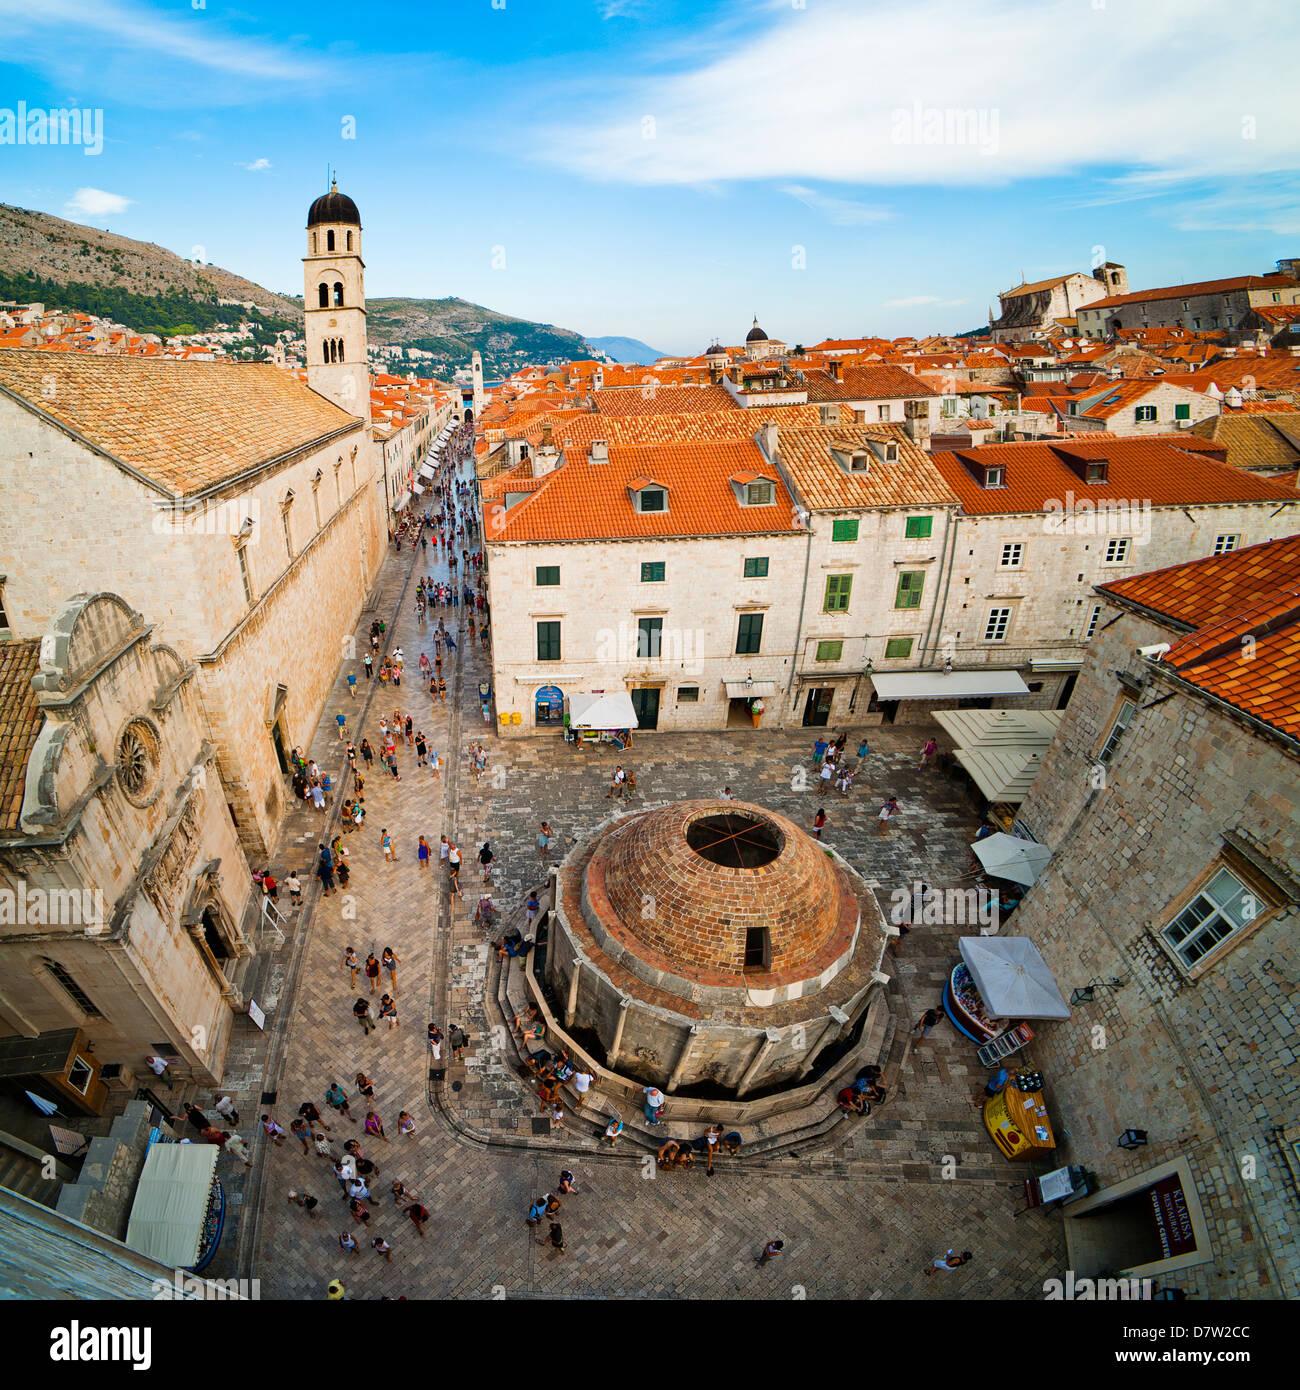 Großer Onforio Brunnen, Franziskaner-Kloster und Stadt Glockenturm, UNESCO-Weltkulturerbe, Dubrovnik, Dalmatien, Stockbild